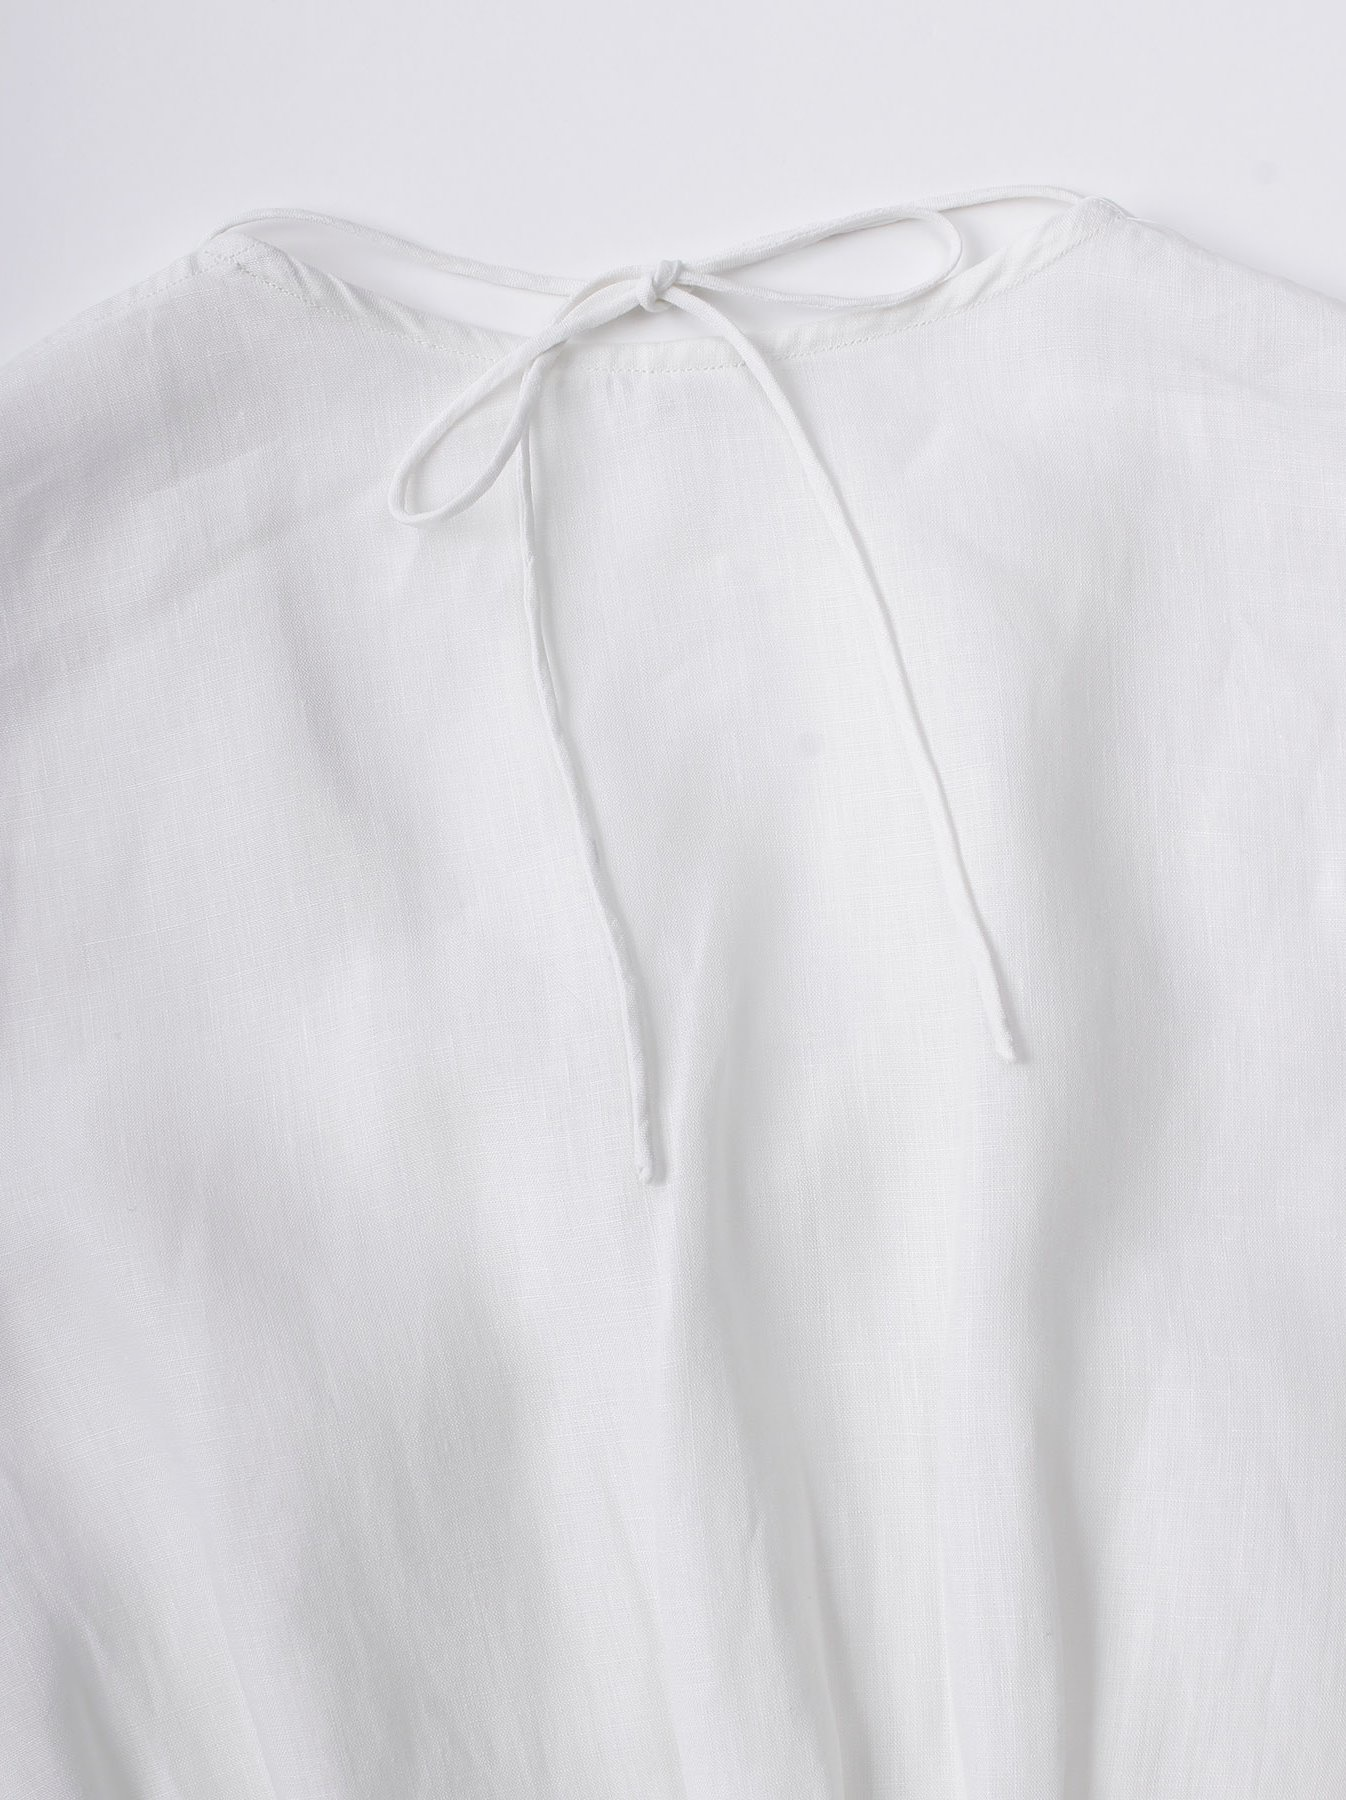 WH Linen Sleeveless Tuck Dress-7